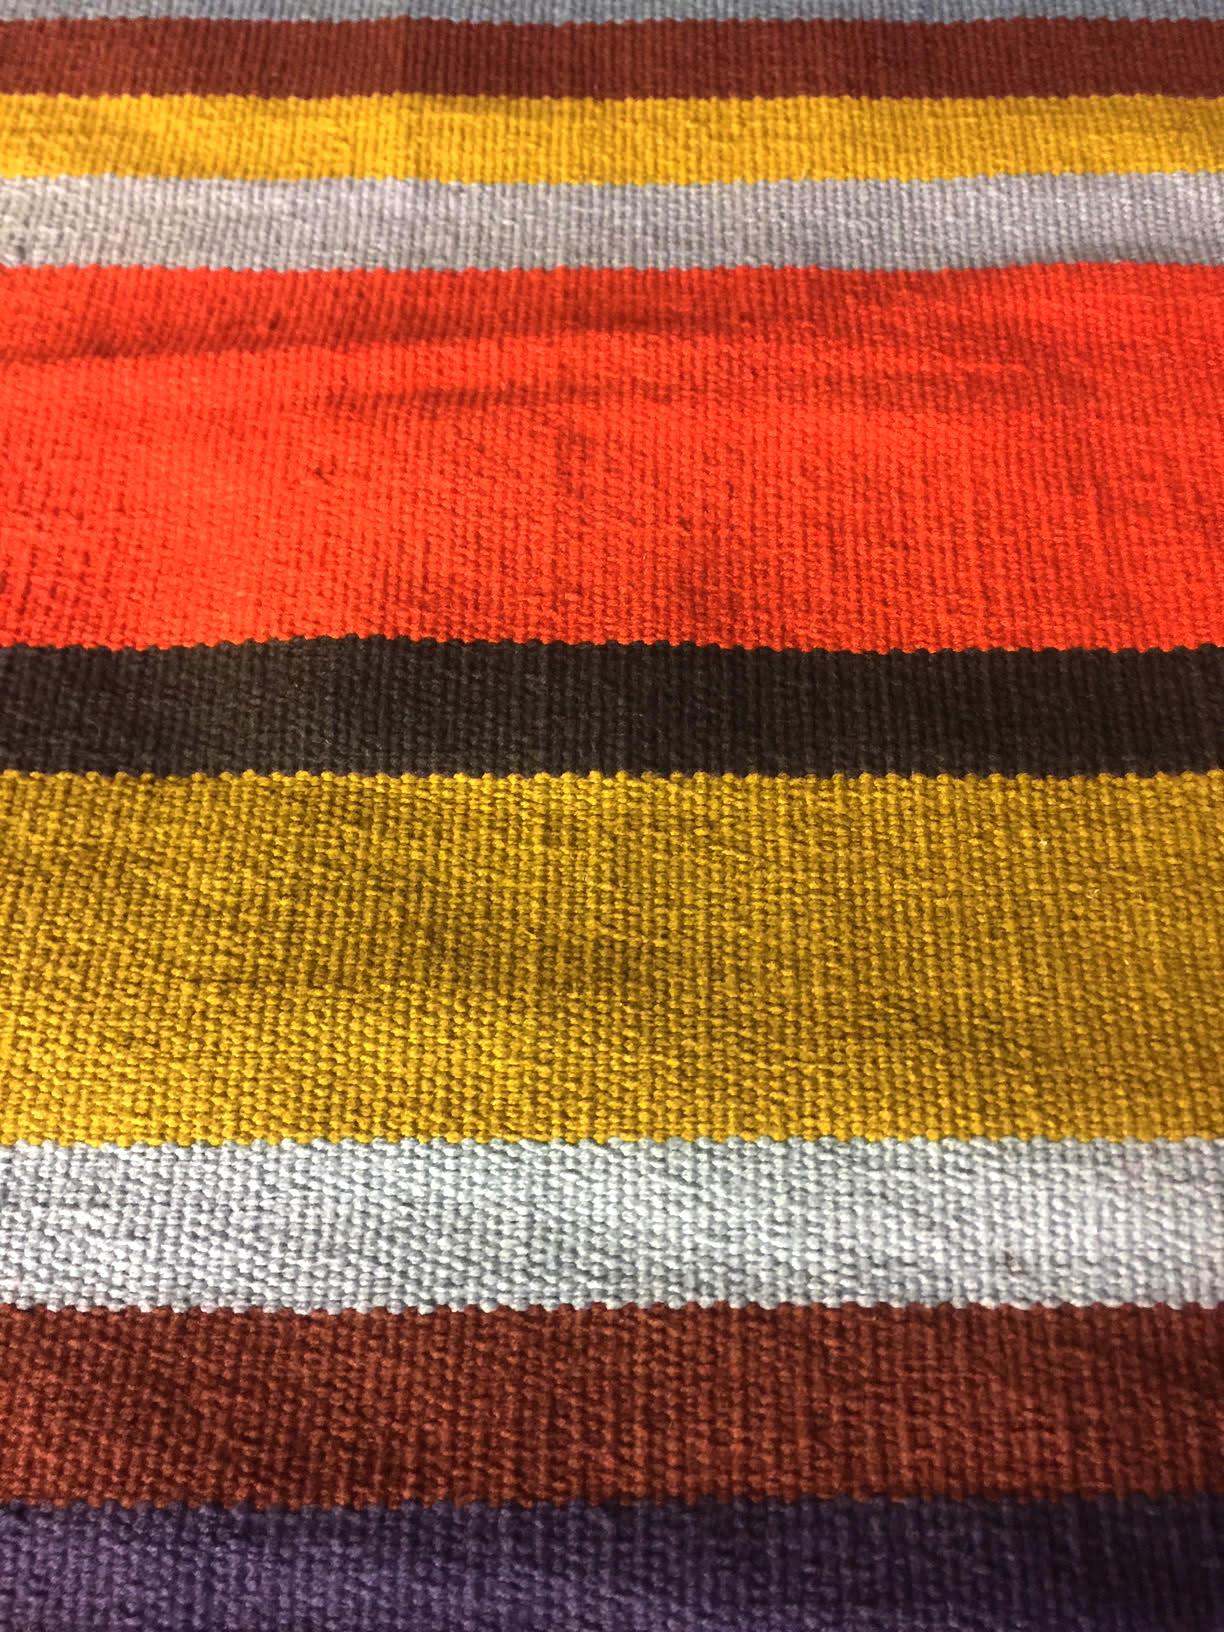 Crate & Barrel Tucker Stripe Cotton Rug